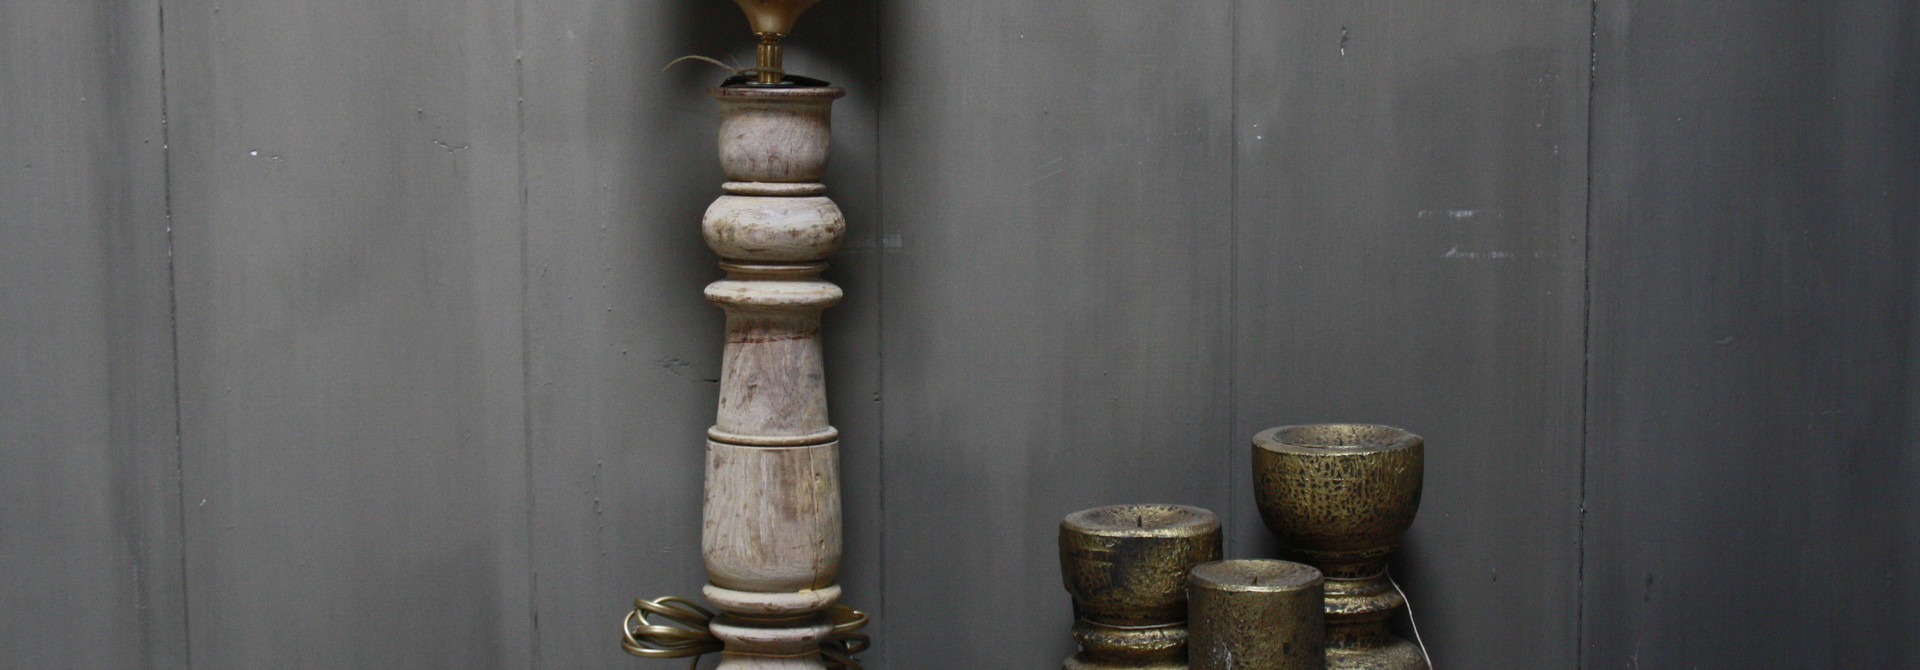 Aura peeperkorn oud houten baluster lamp 60 cm